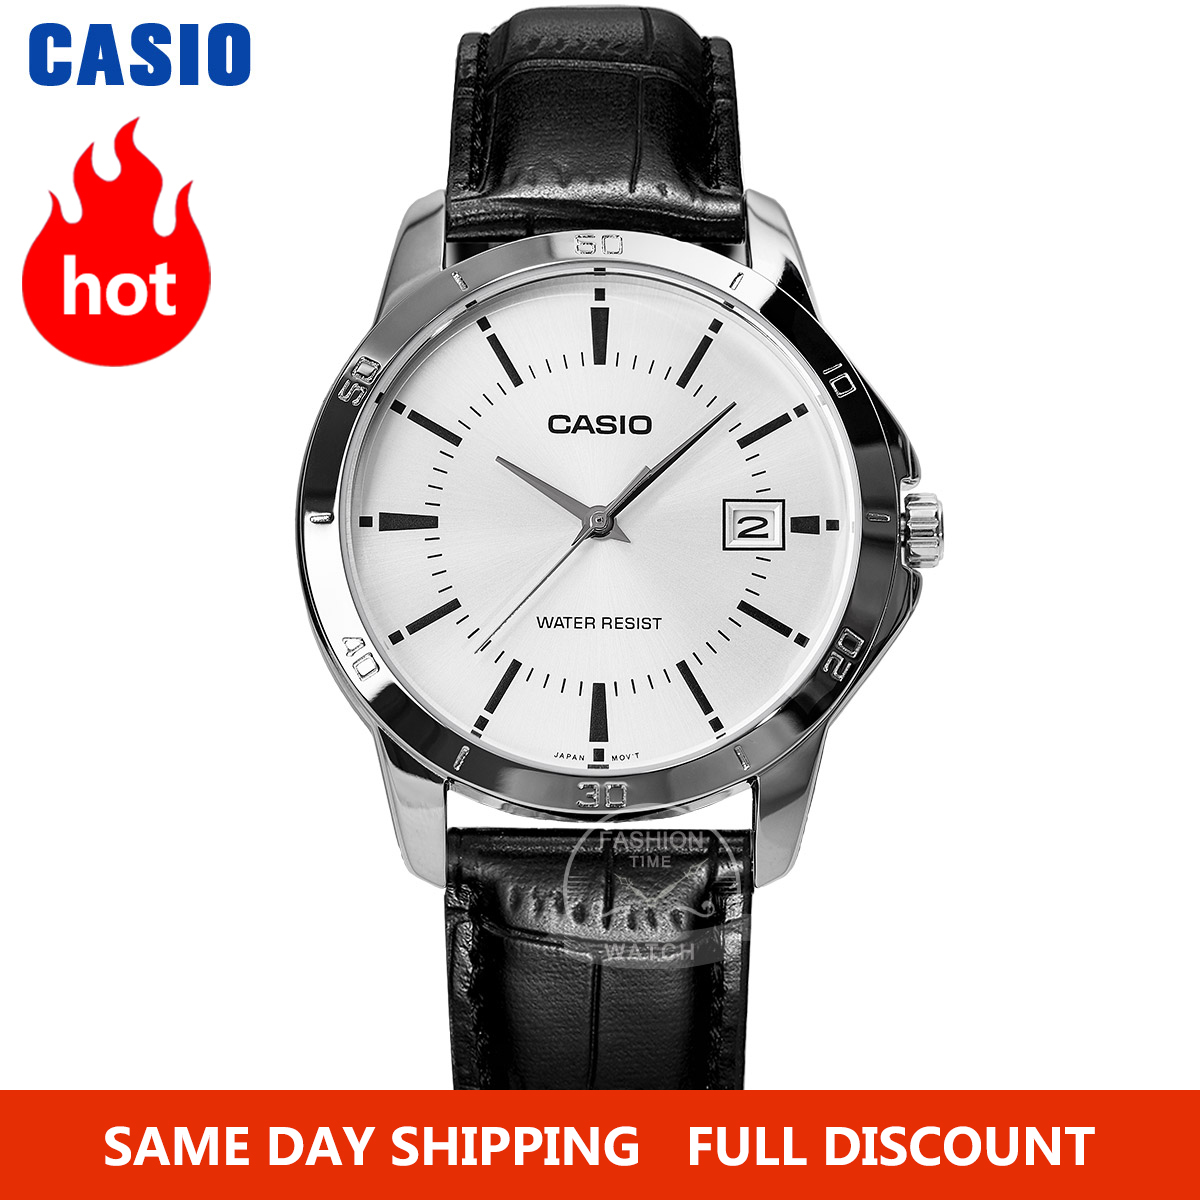 Casio watch new watch men top brand luxury set quartz watche military men clock 30m Waterproof men watch Sport Wrist Watch reloj|Quartz Watches| - AliExpress